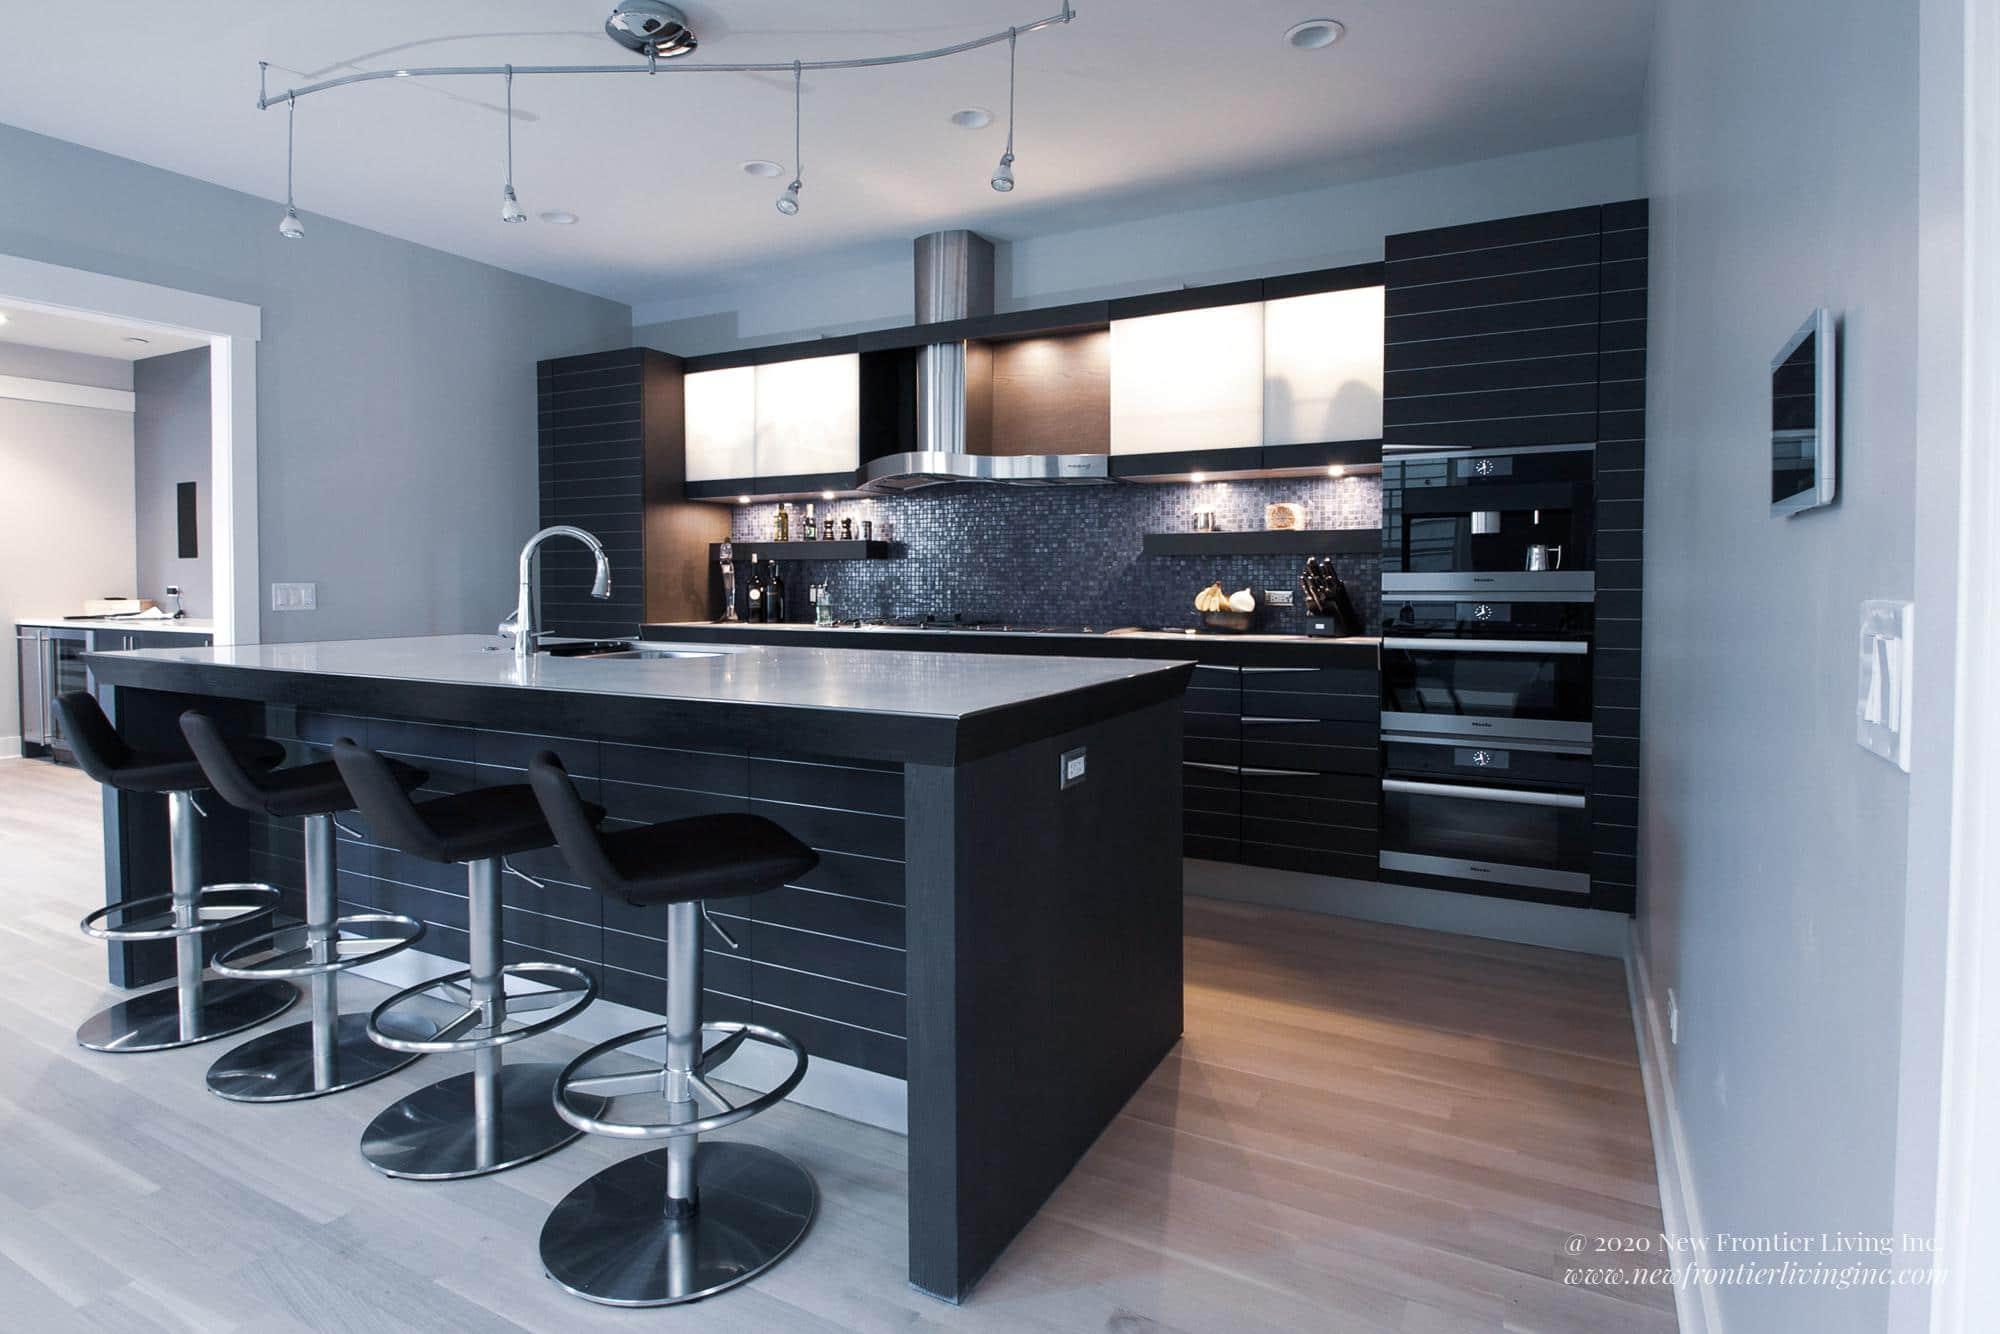 Black kitchen with light spaces, black kitchen island, sliding glass upper cabinets